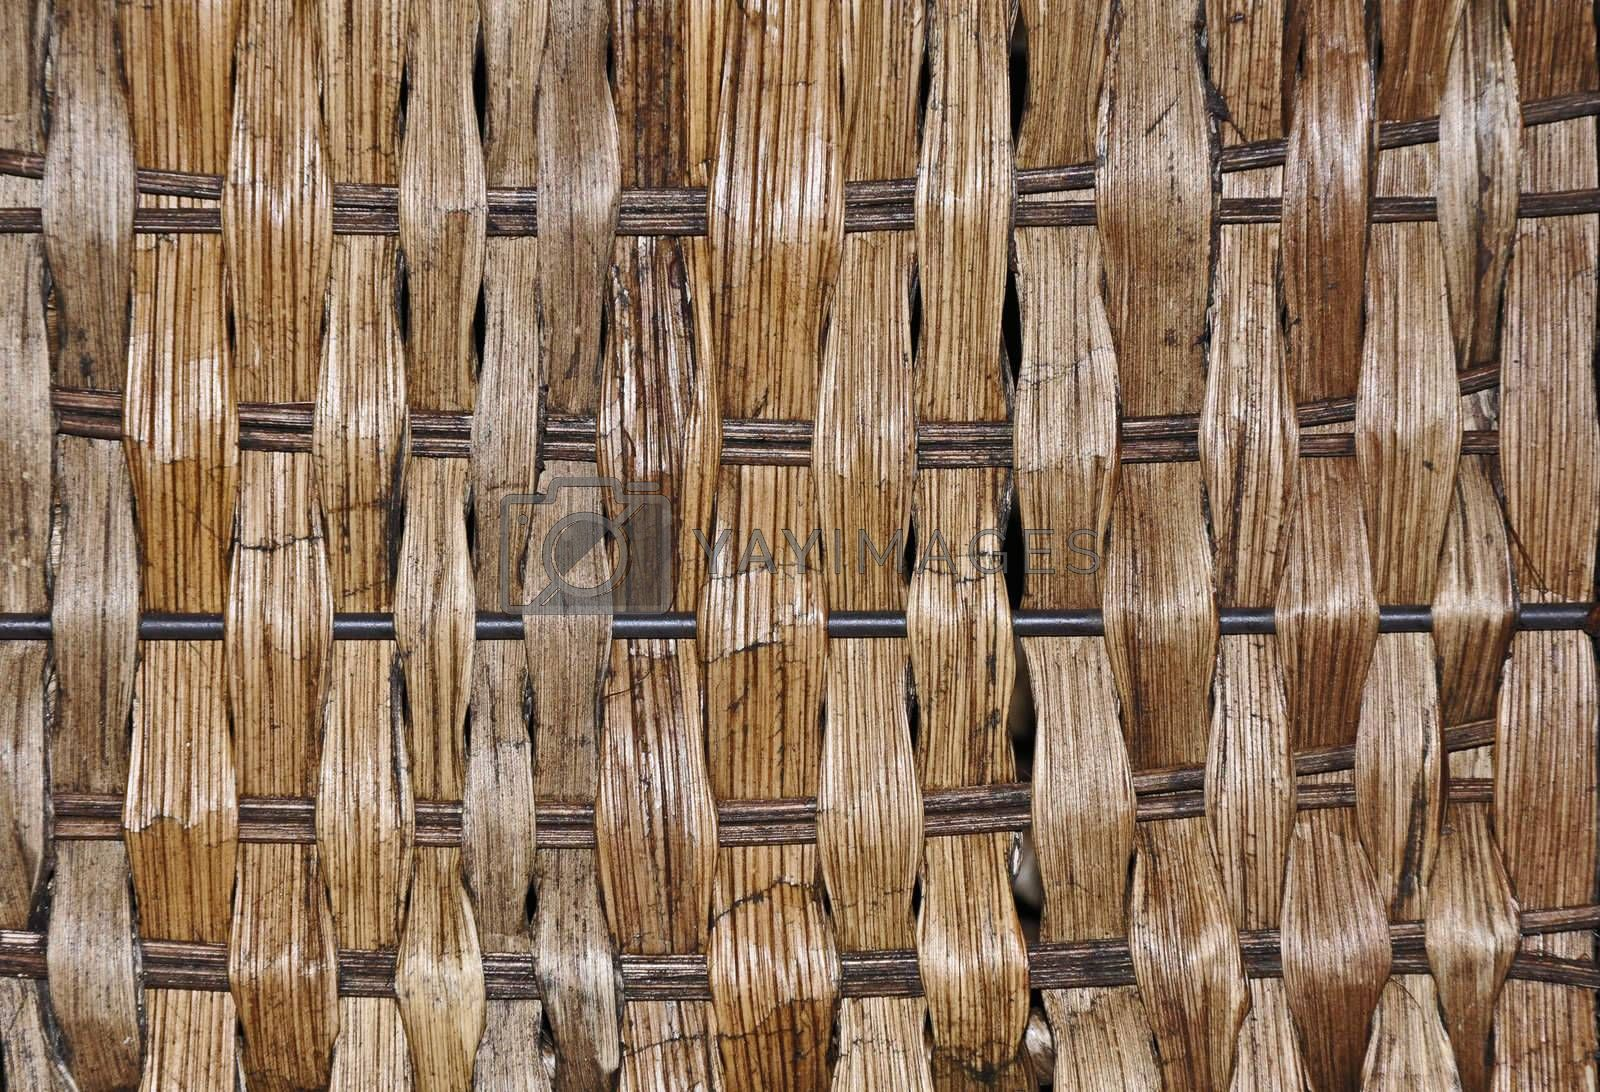 closeup view of a brown wicker basket